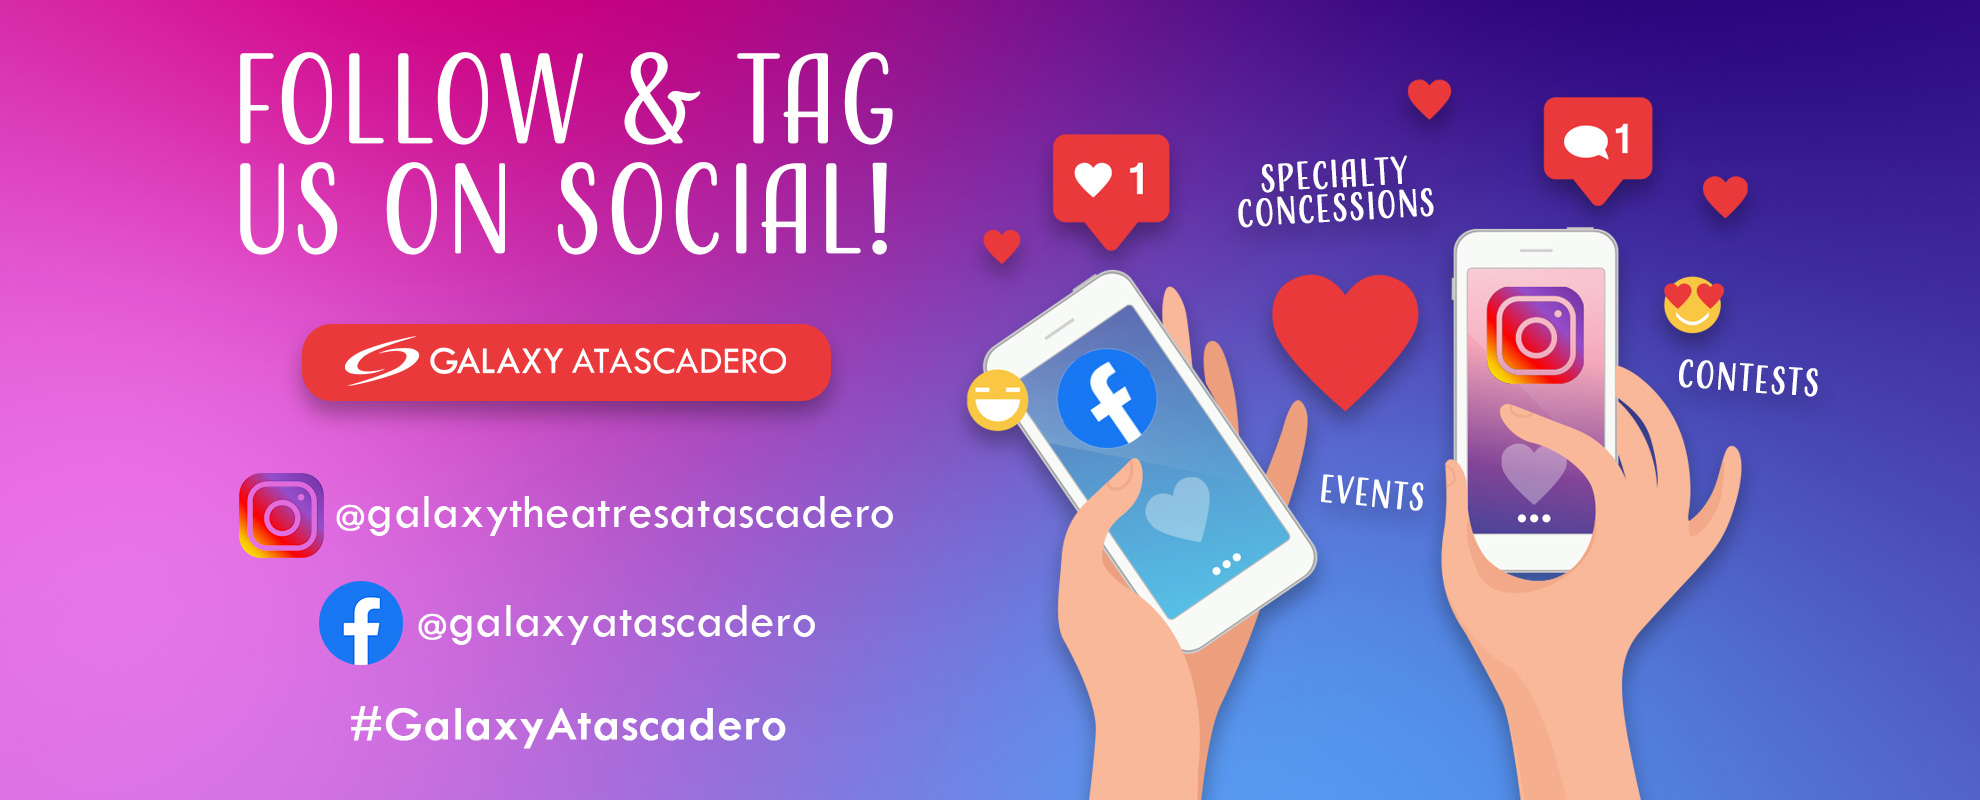 Socials/Hashtag - Atascadero image